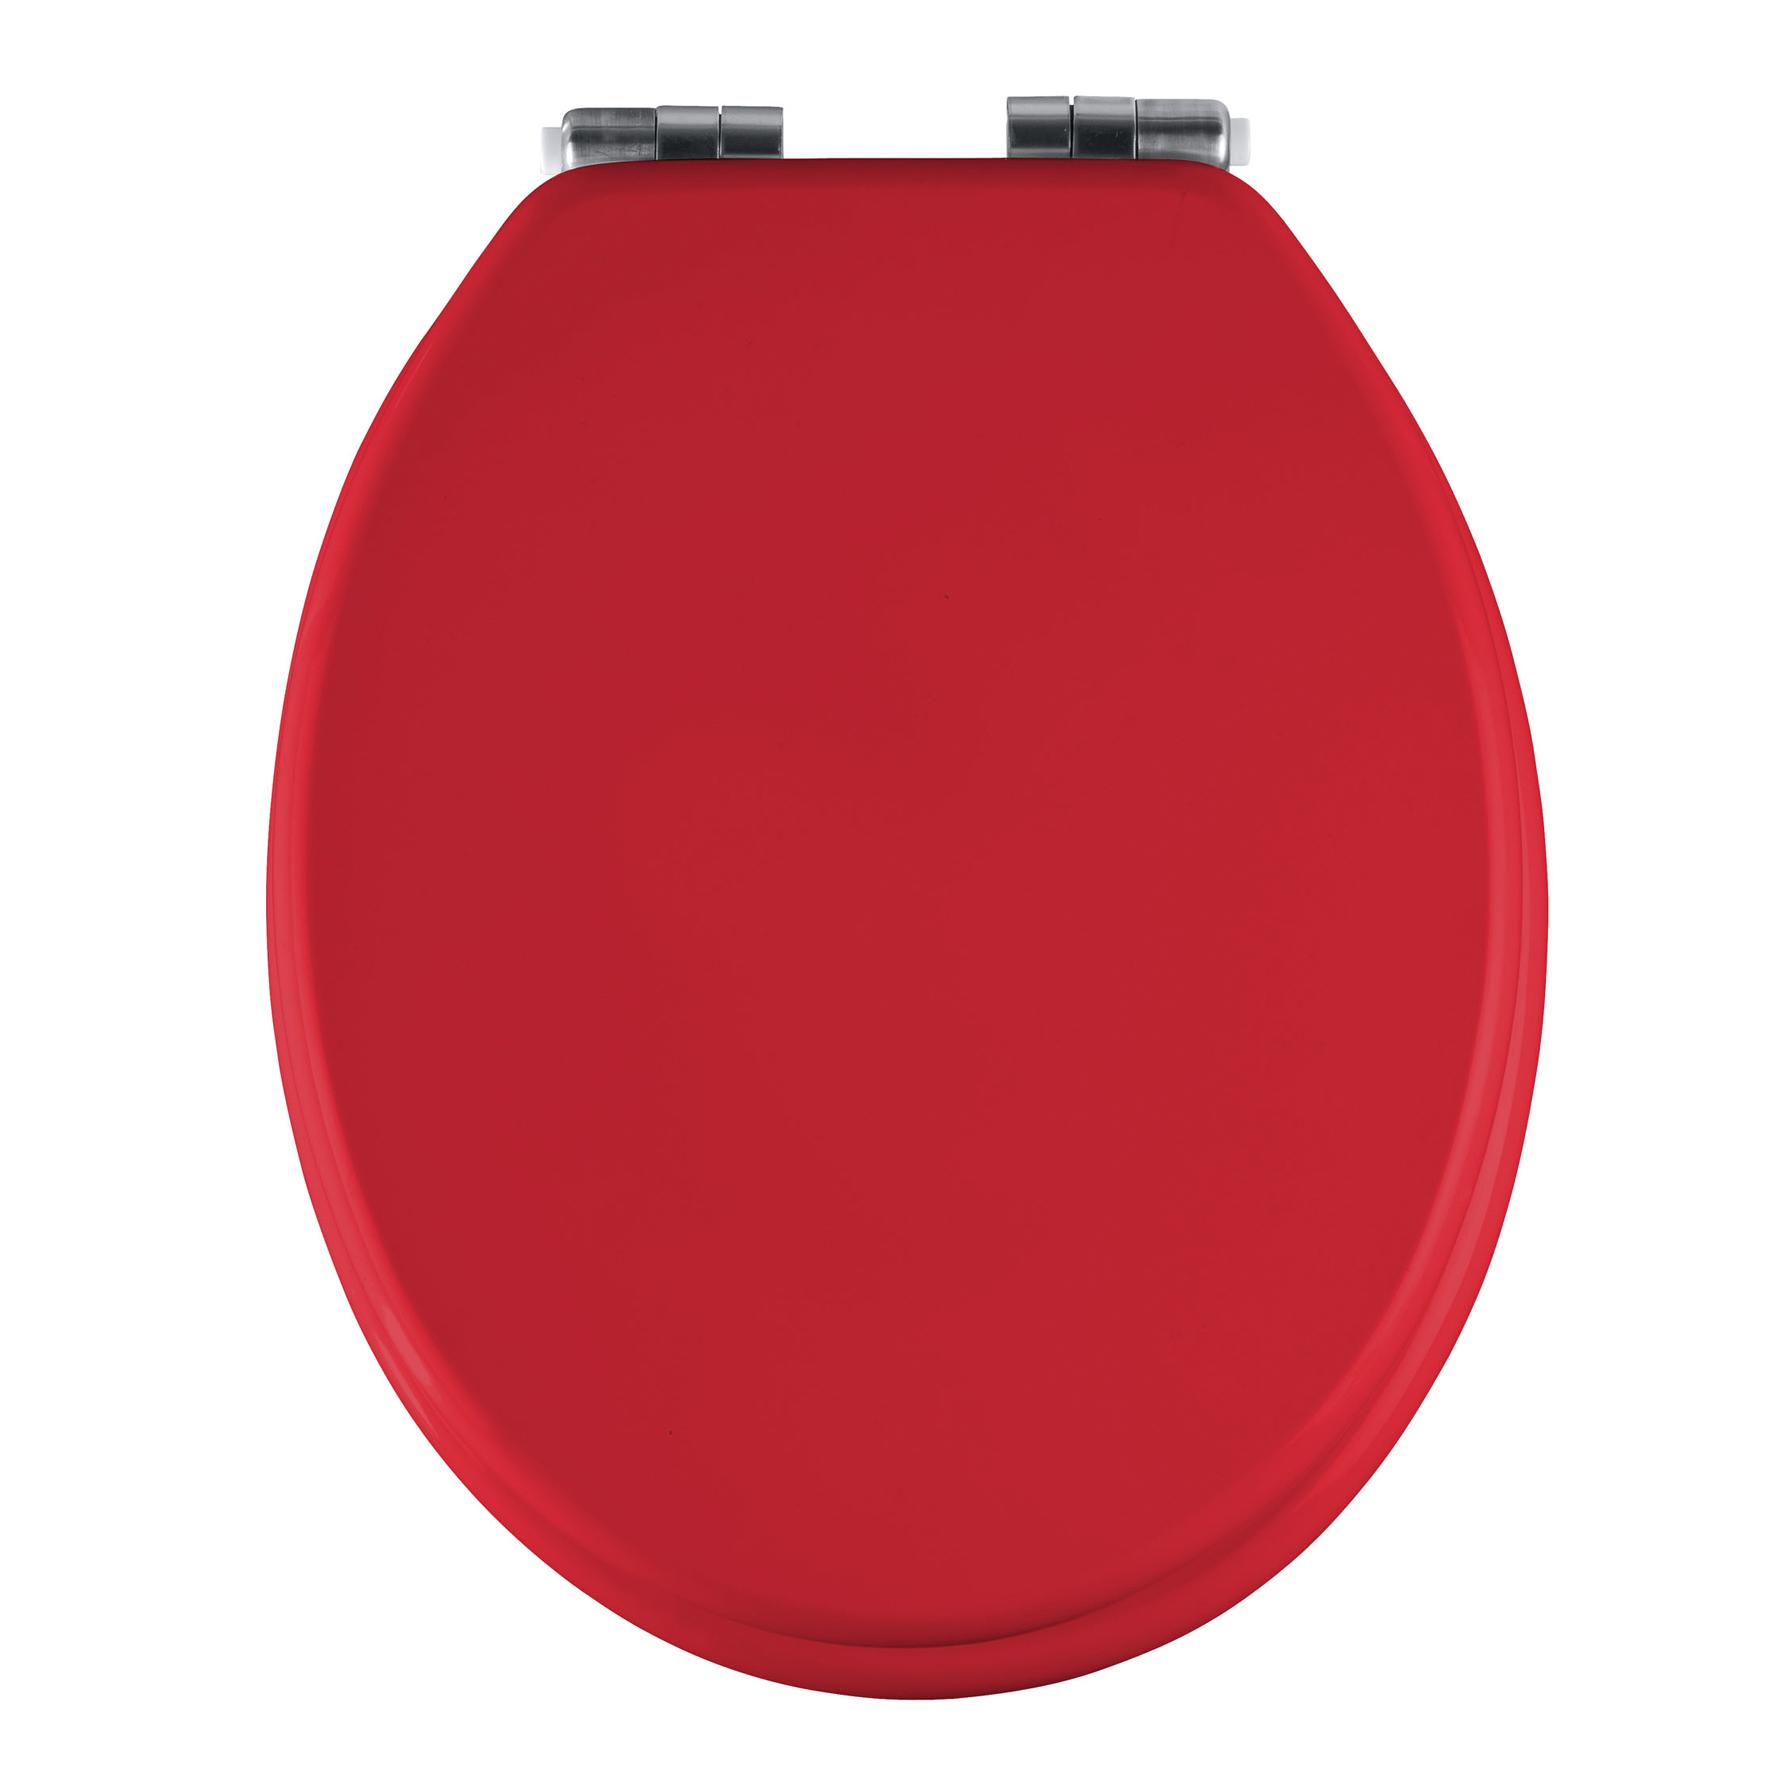 wenko wc sitz texel rot matt toilettendeckel toilette toilettensitz klodeckel ebay. Black Bedroom Furniture Sets. Home Design Ideas